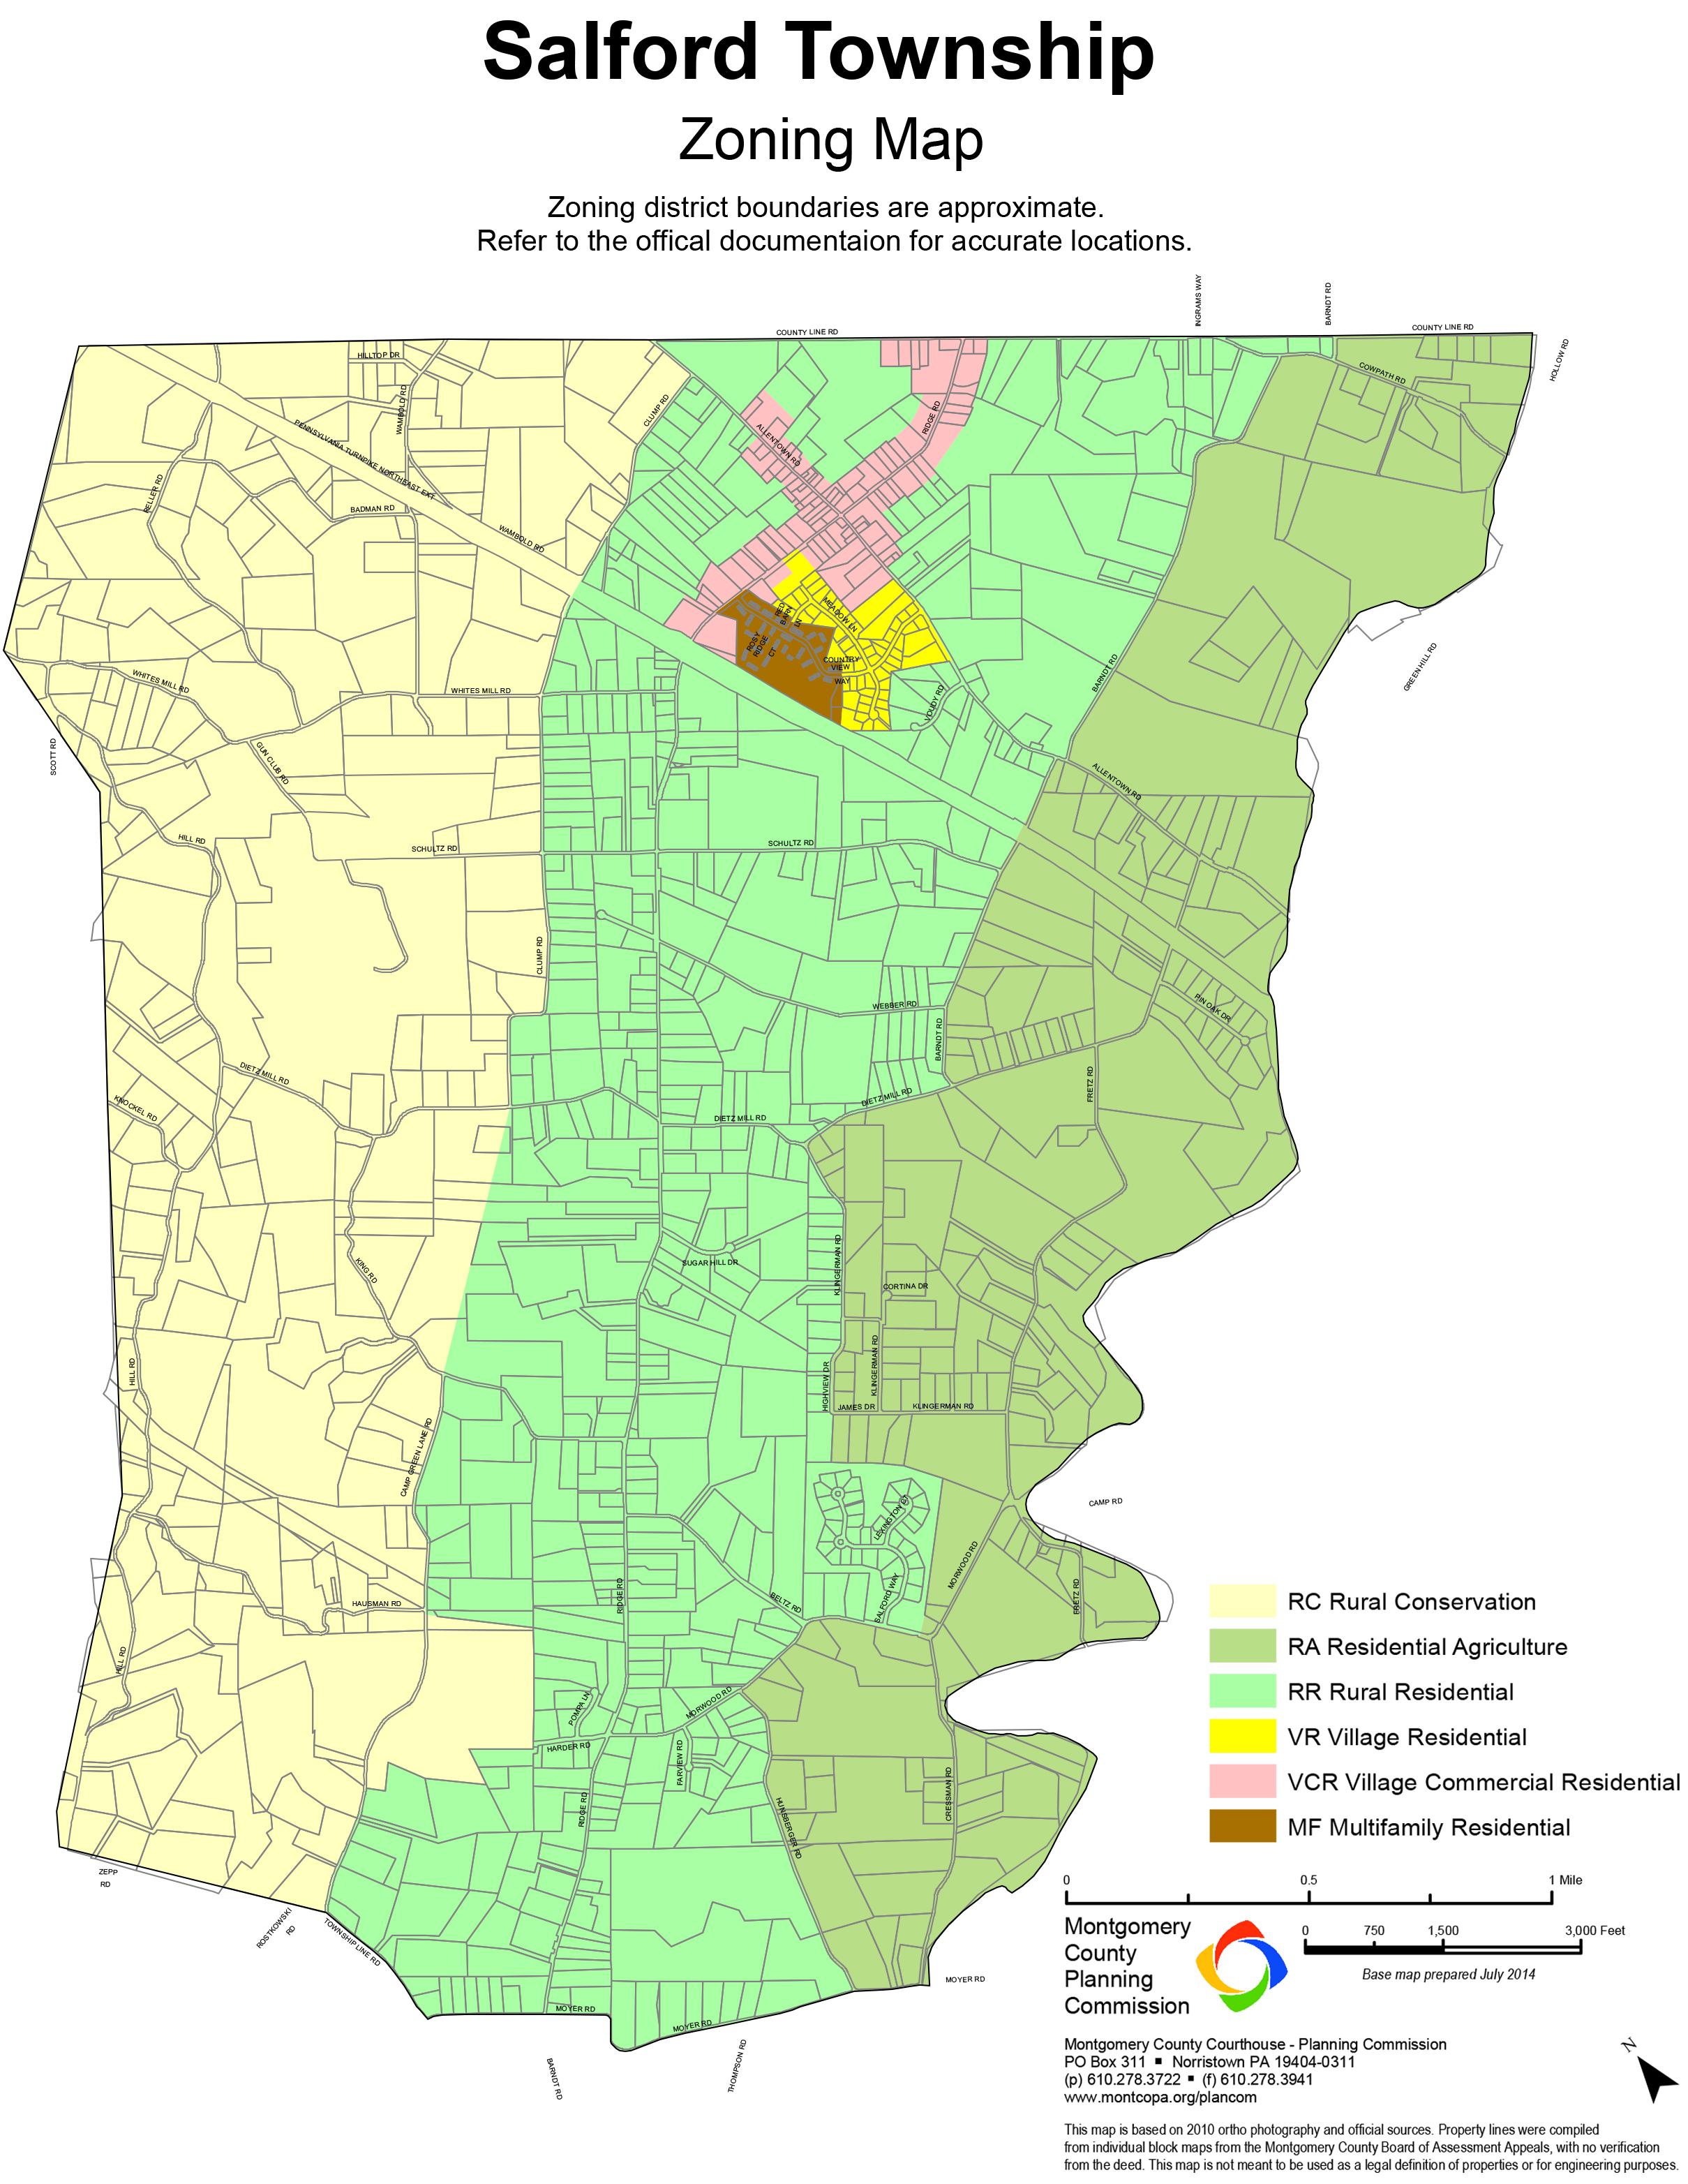 Montgomery County Pa Zip Code Map : montgomery, county, Montgomery, County, Maping, Resources